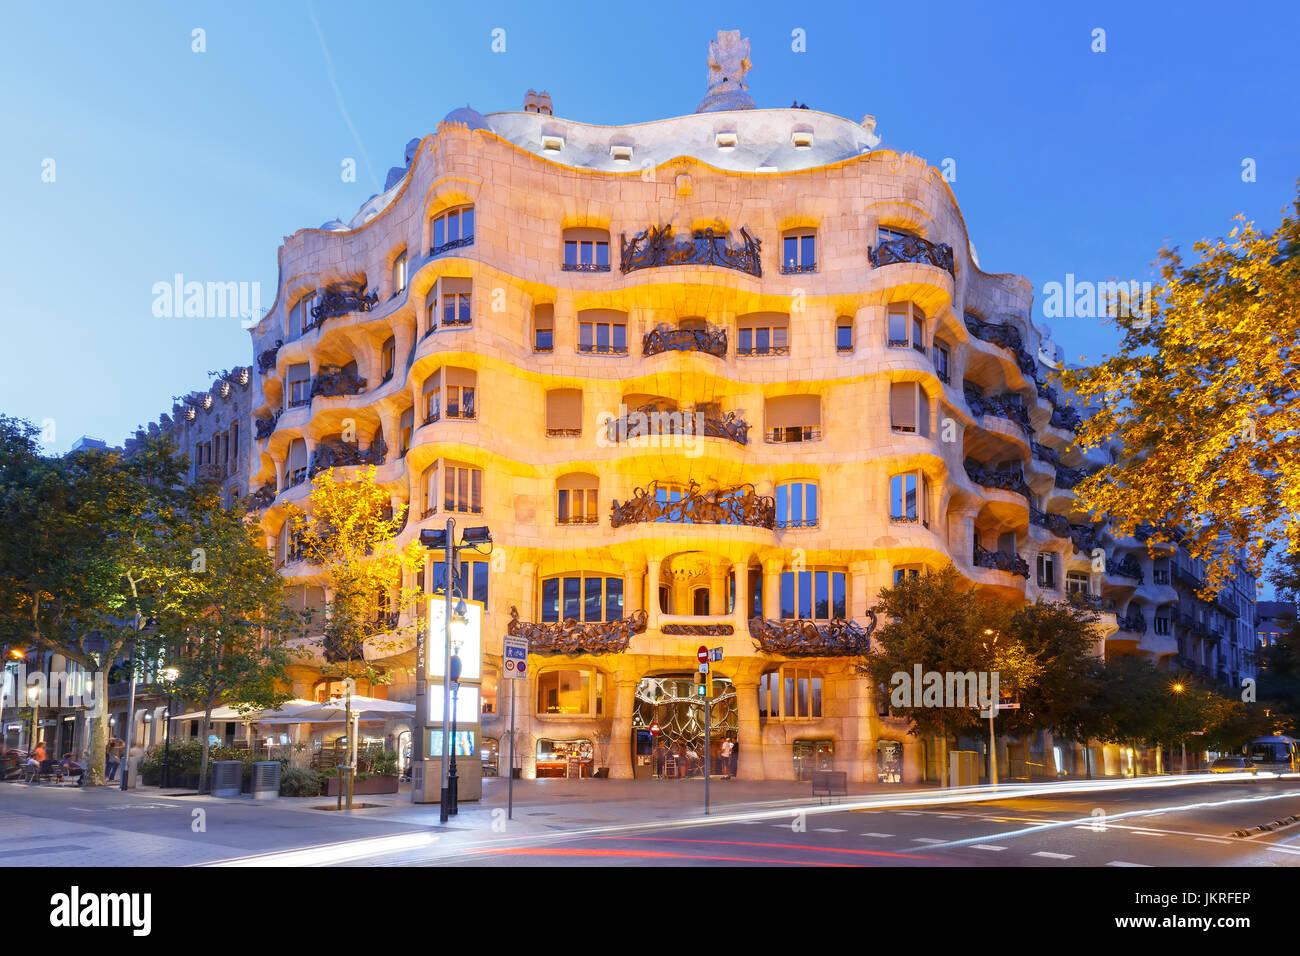 Casa Mila la nuit, Barcelone, Espagne Photo Stock